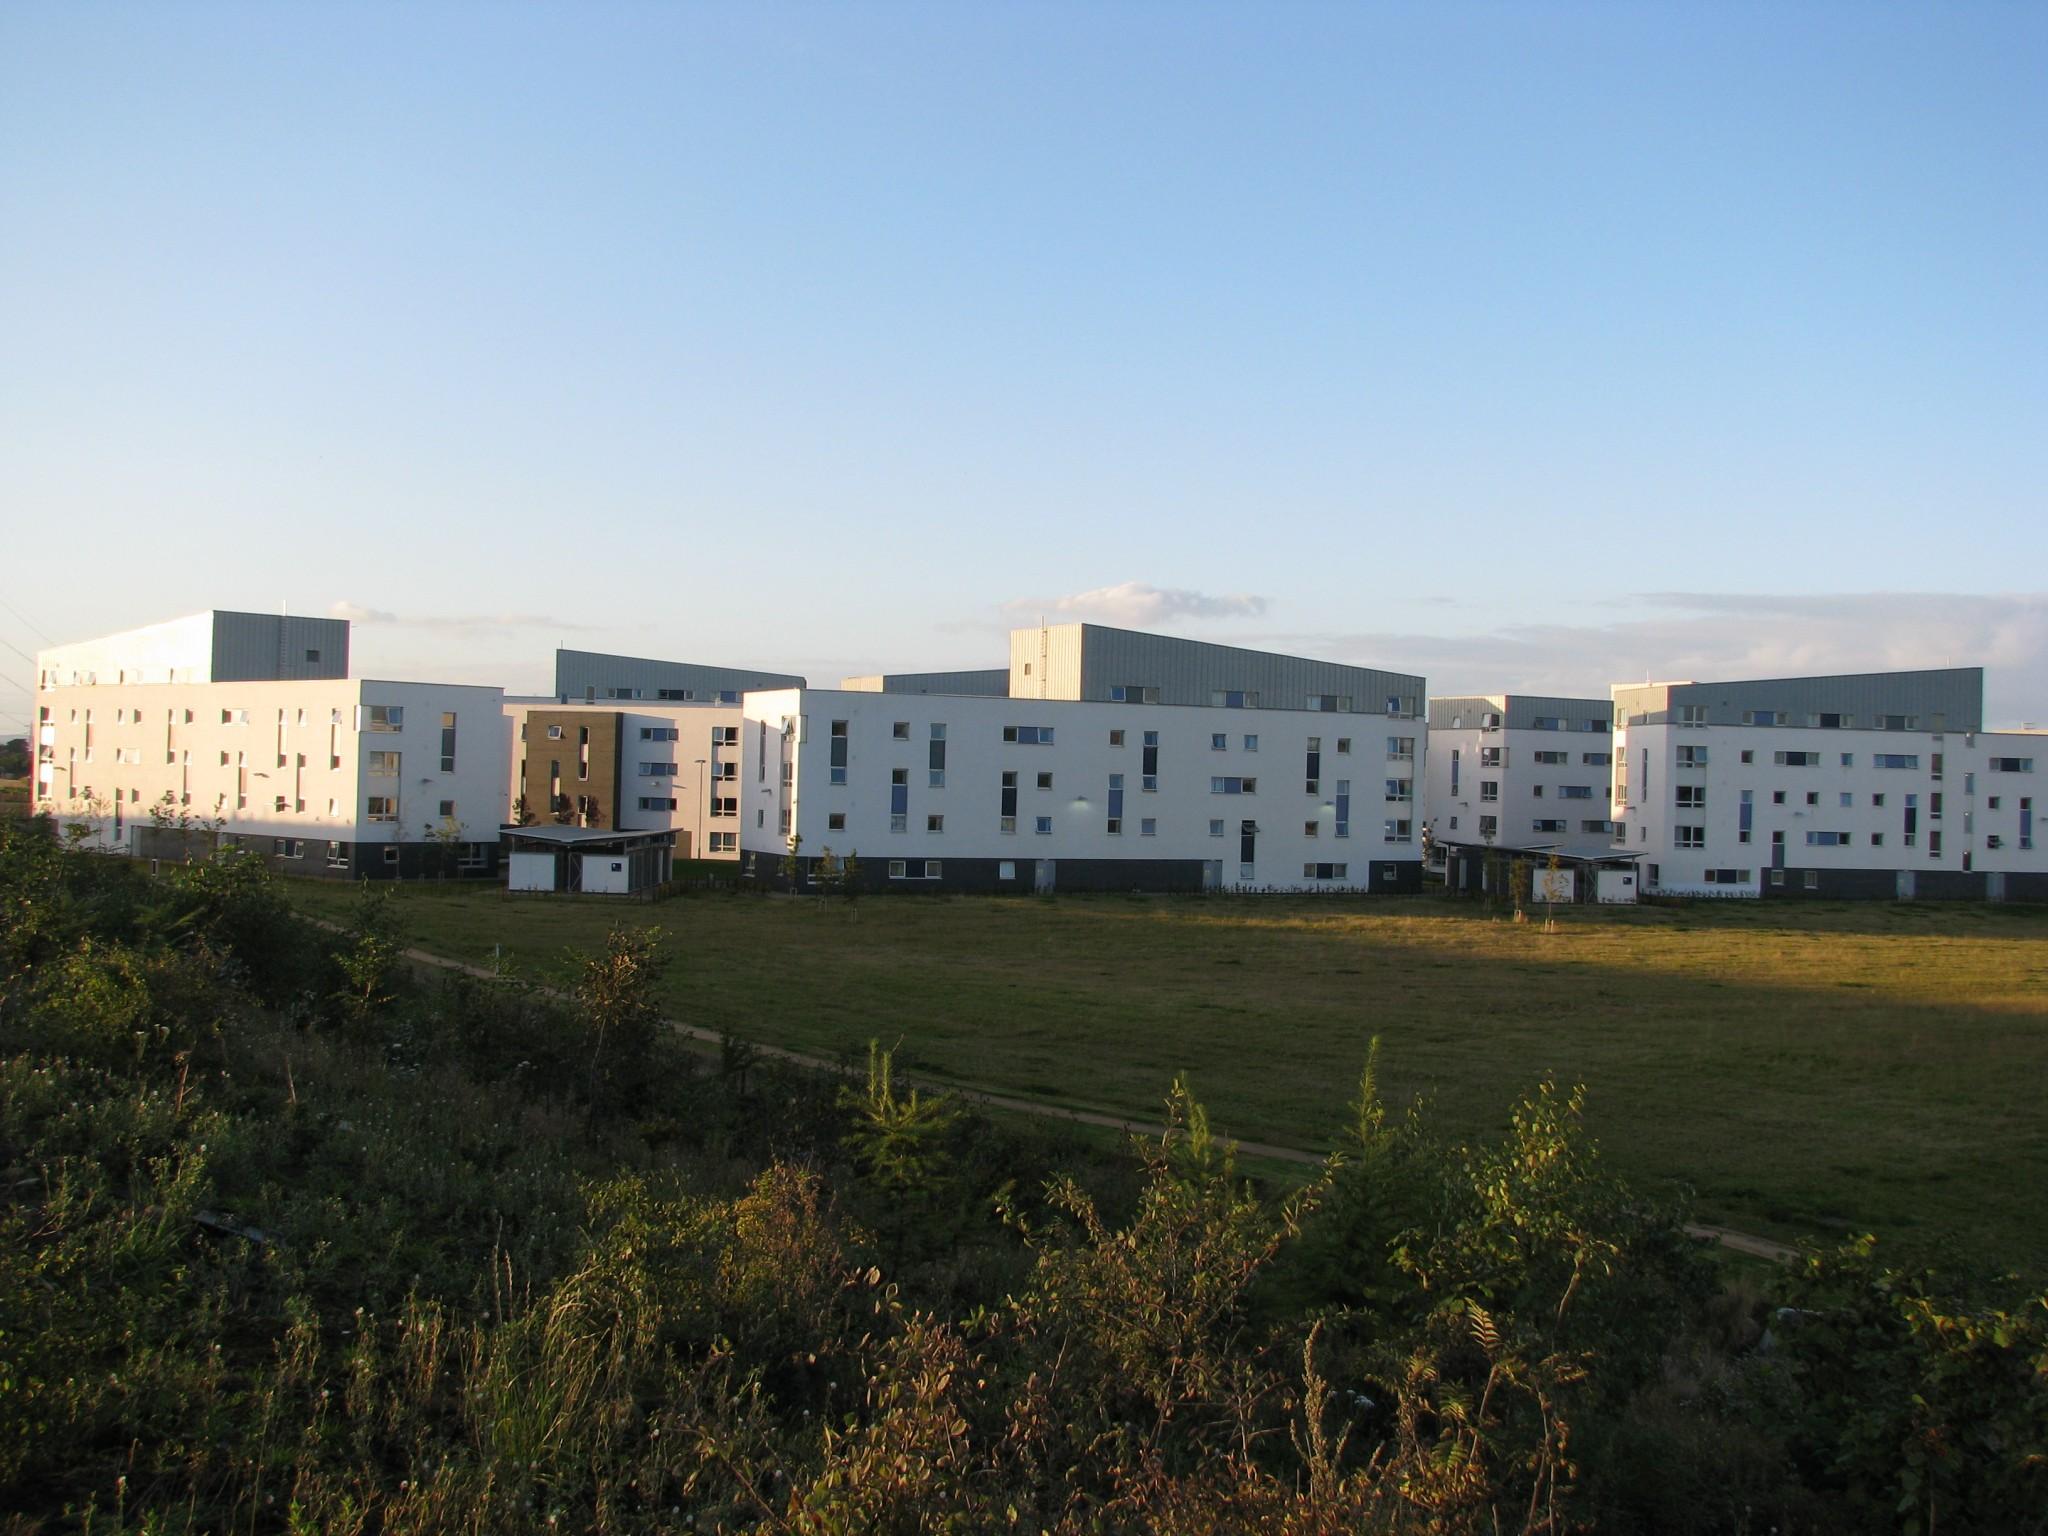 queen_margaret_university_student_accommodation.jpg